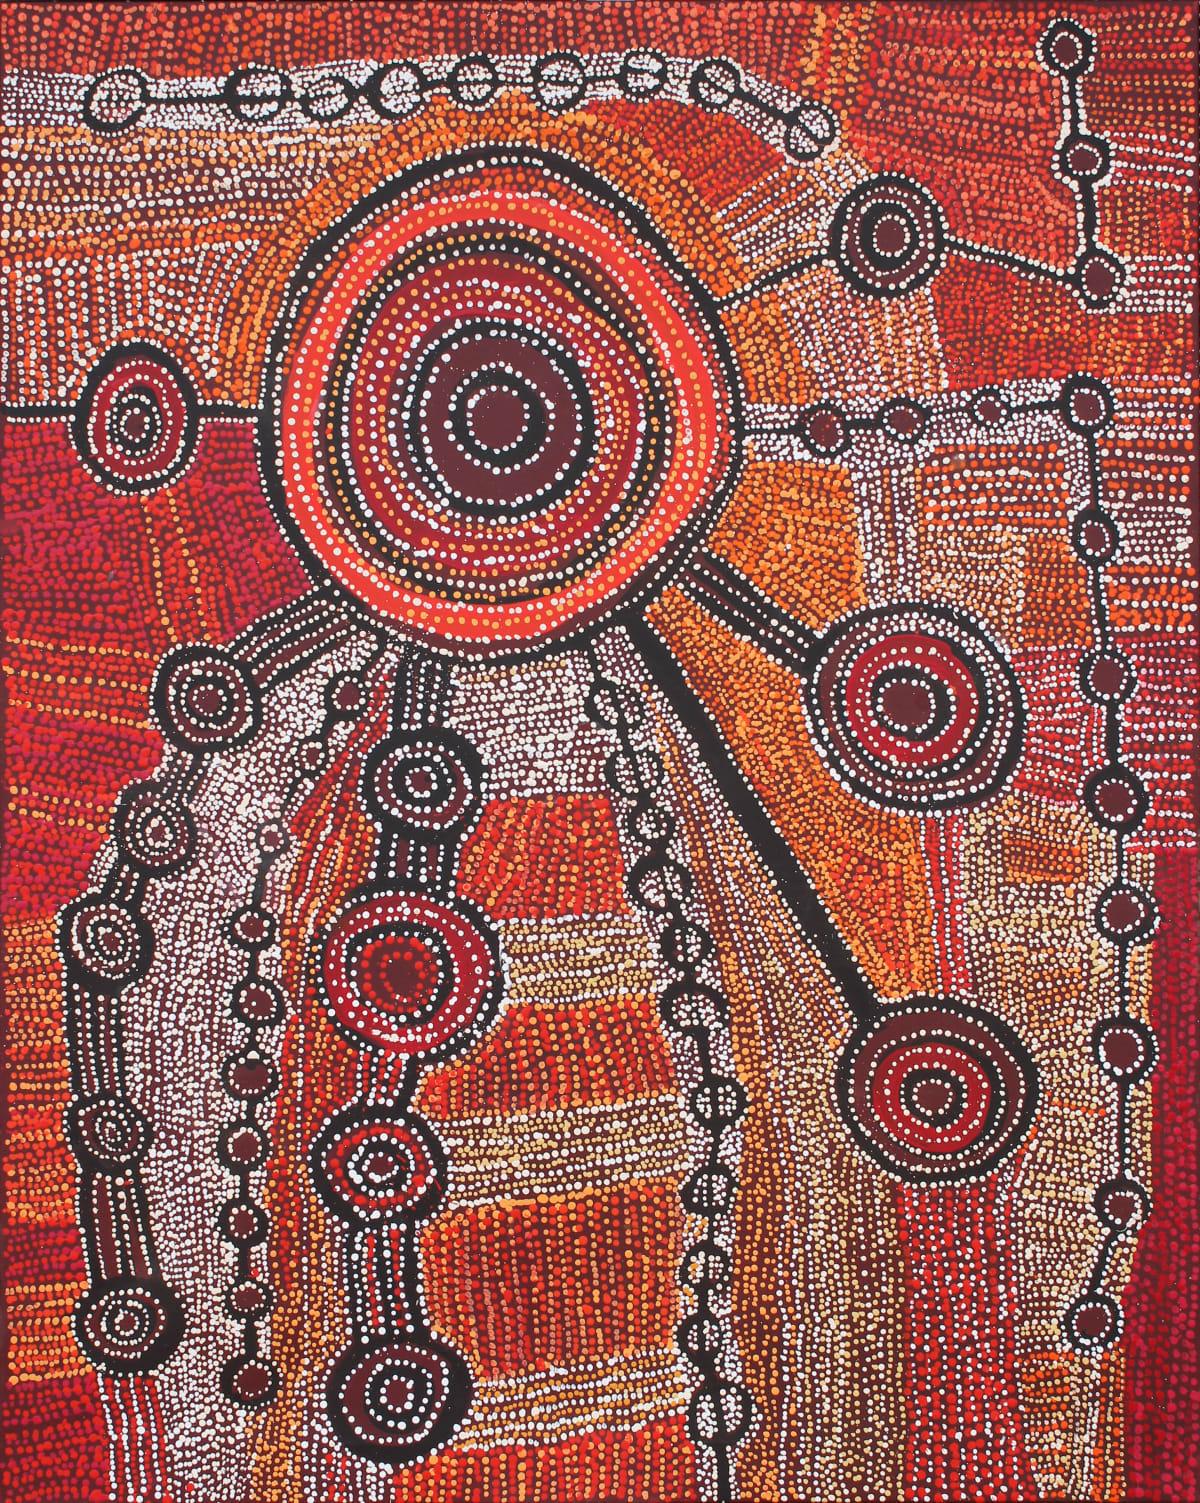 Willy Muntjanti Martin Wanampi Tjukurpa acrylic on linen 152 x 122 cm